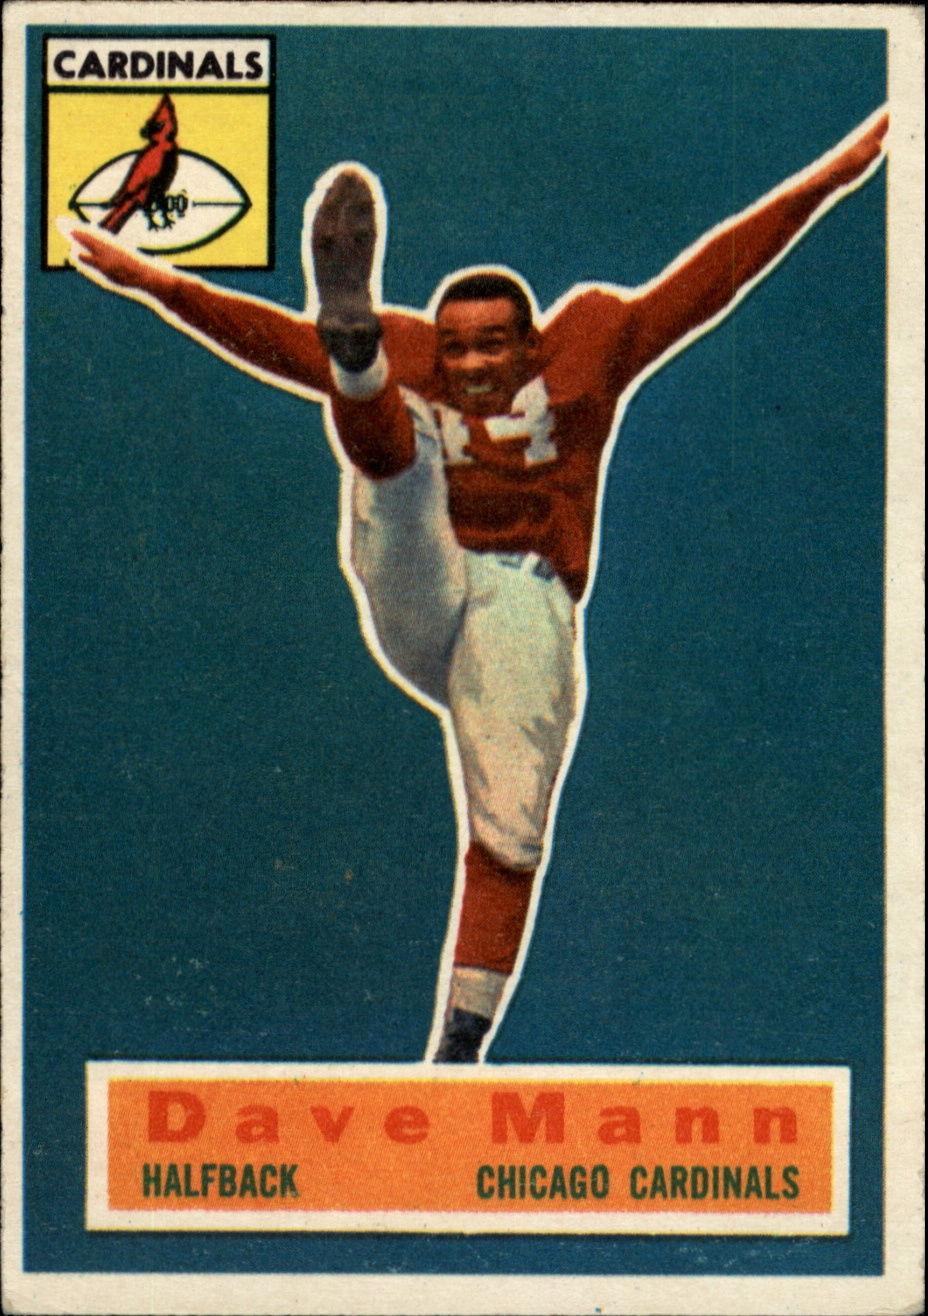 1956 Topps #34 Dave Mann SP RC